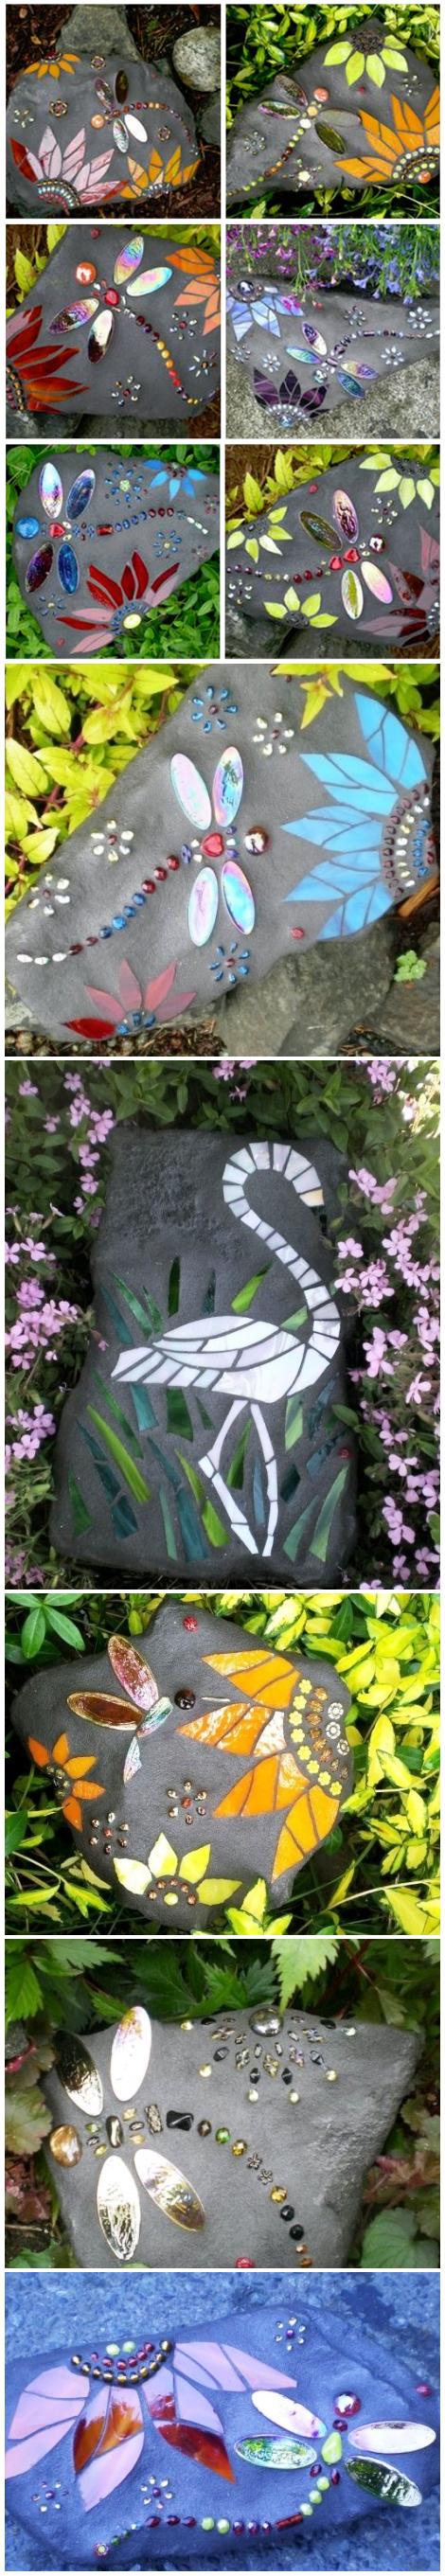 DIY csináld magad kert mozaik